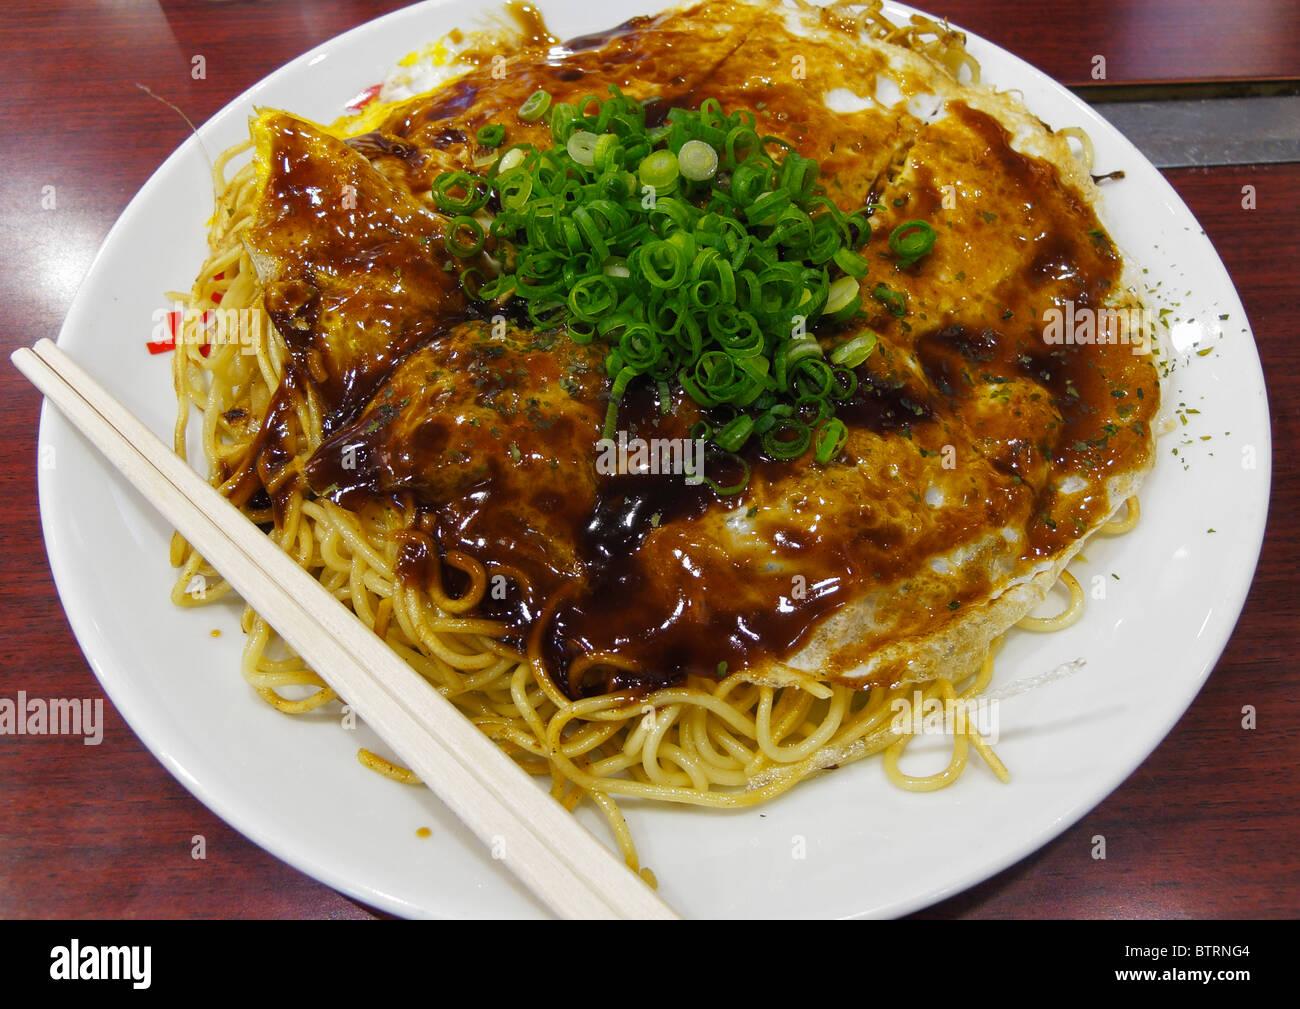 The famous Okonomiyaki dish from Hiroshima district, Hiroshima JP Stock Photo